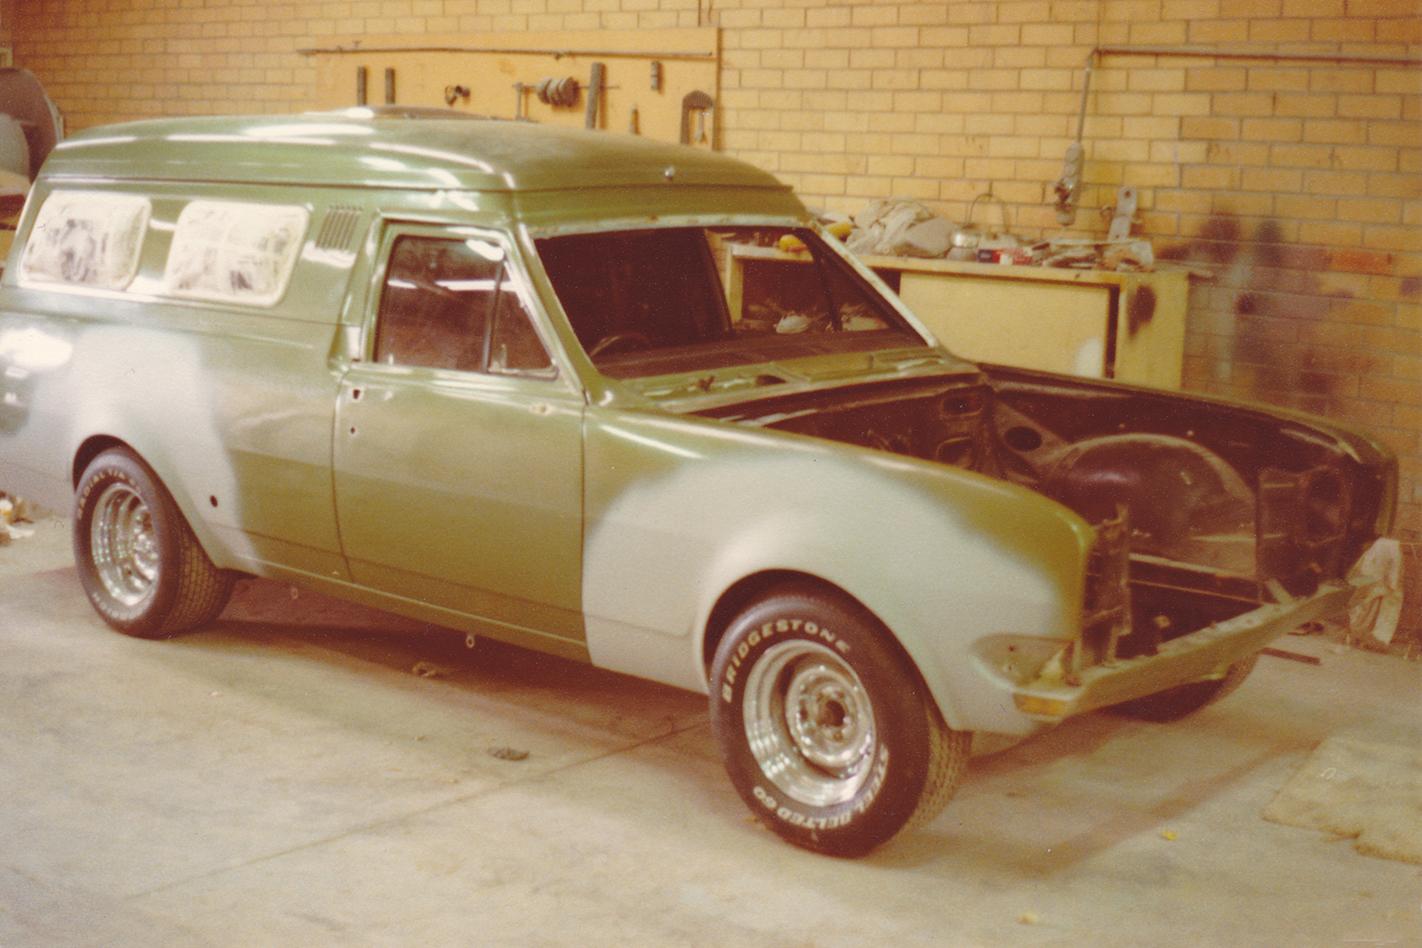 Green -Knight -HG-Panelvan -flares